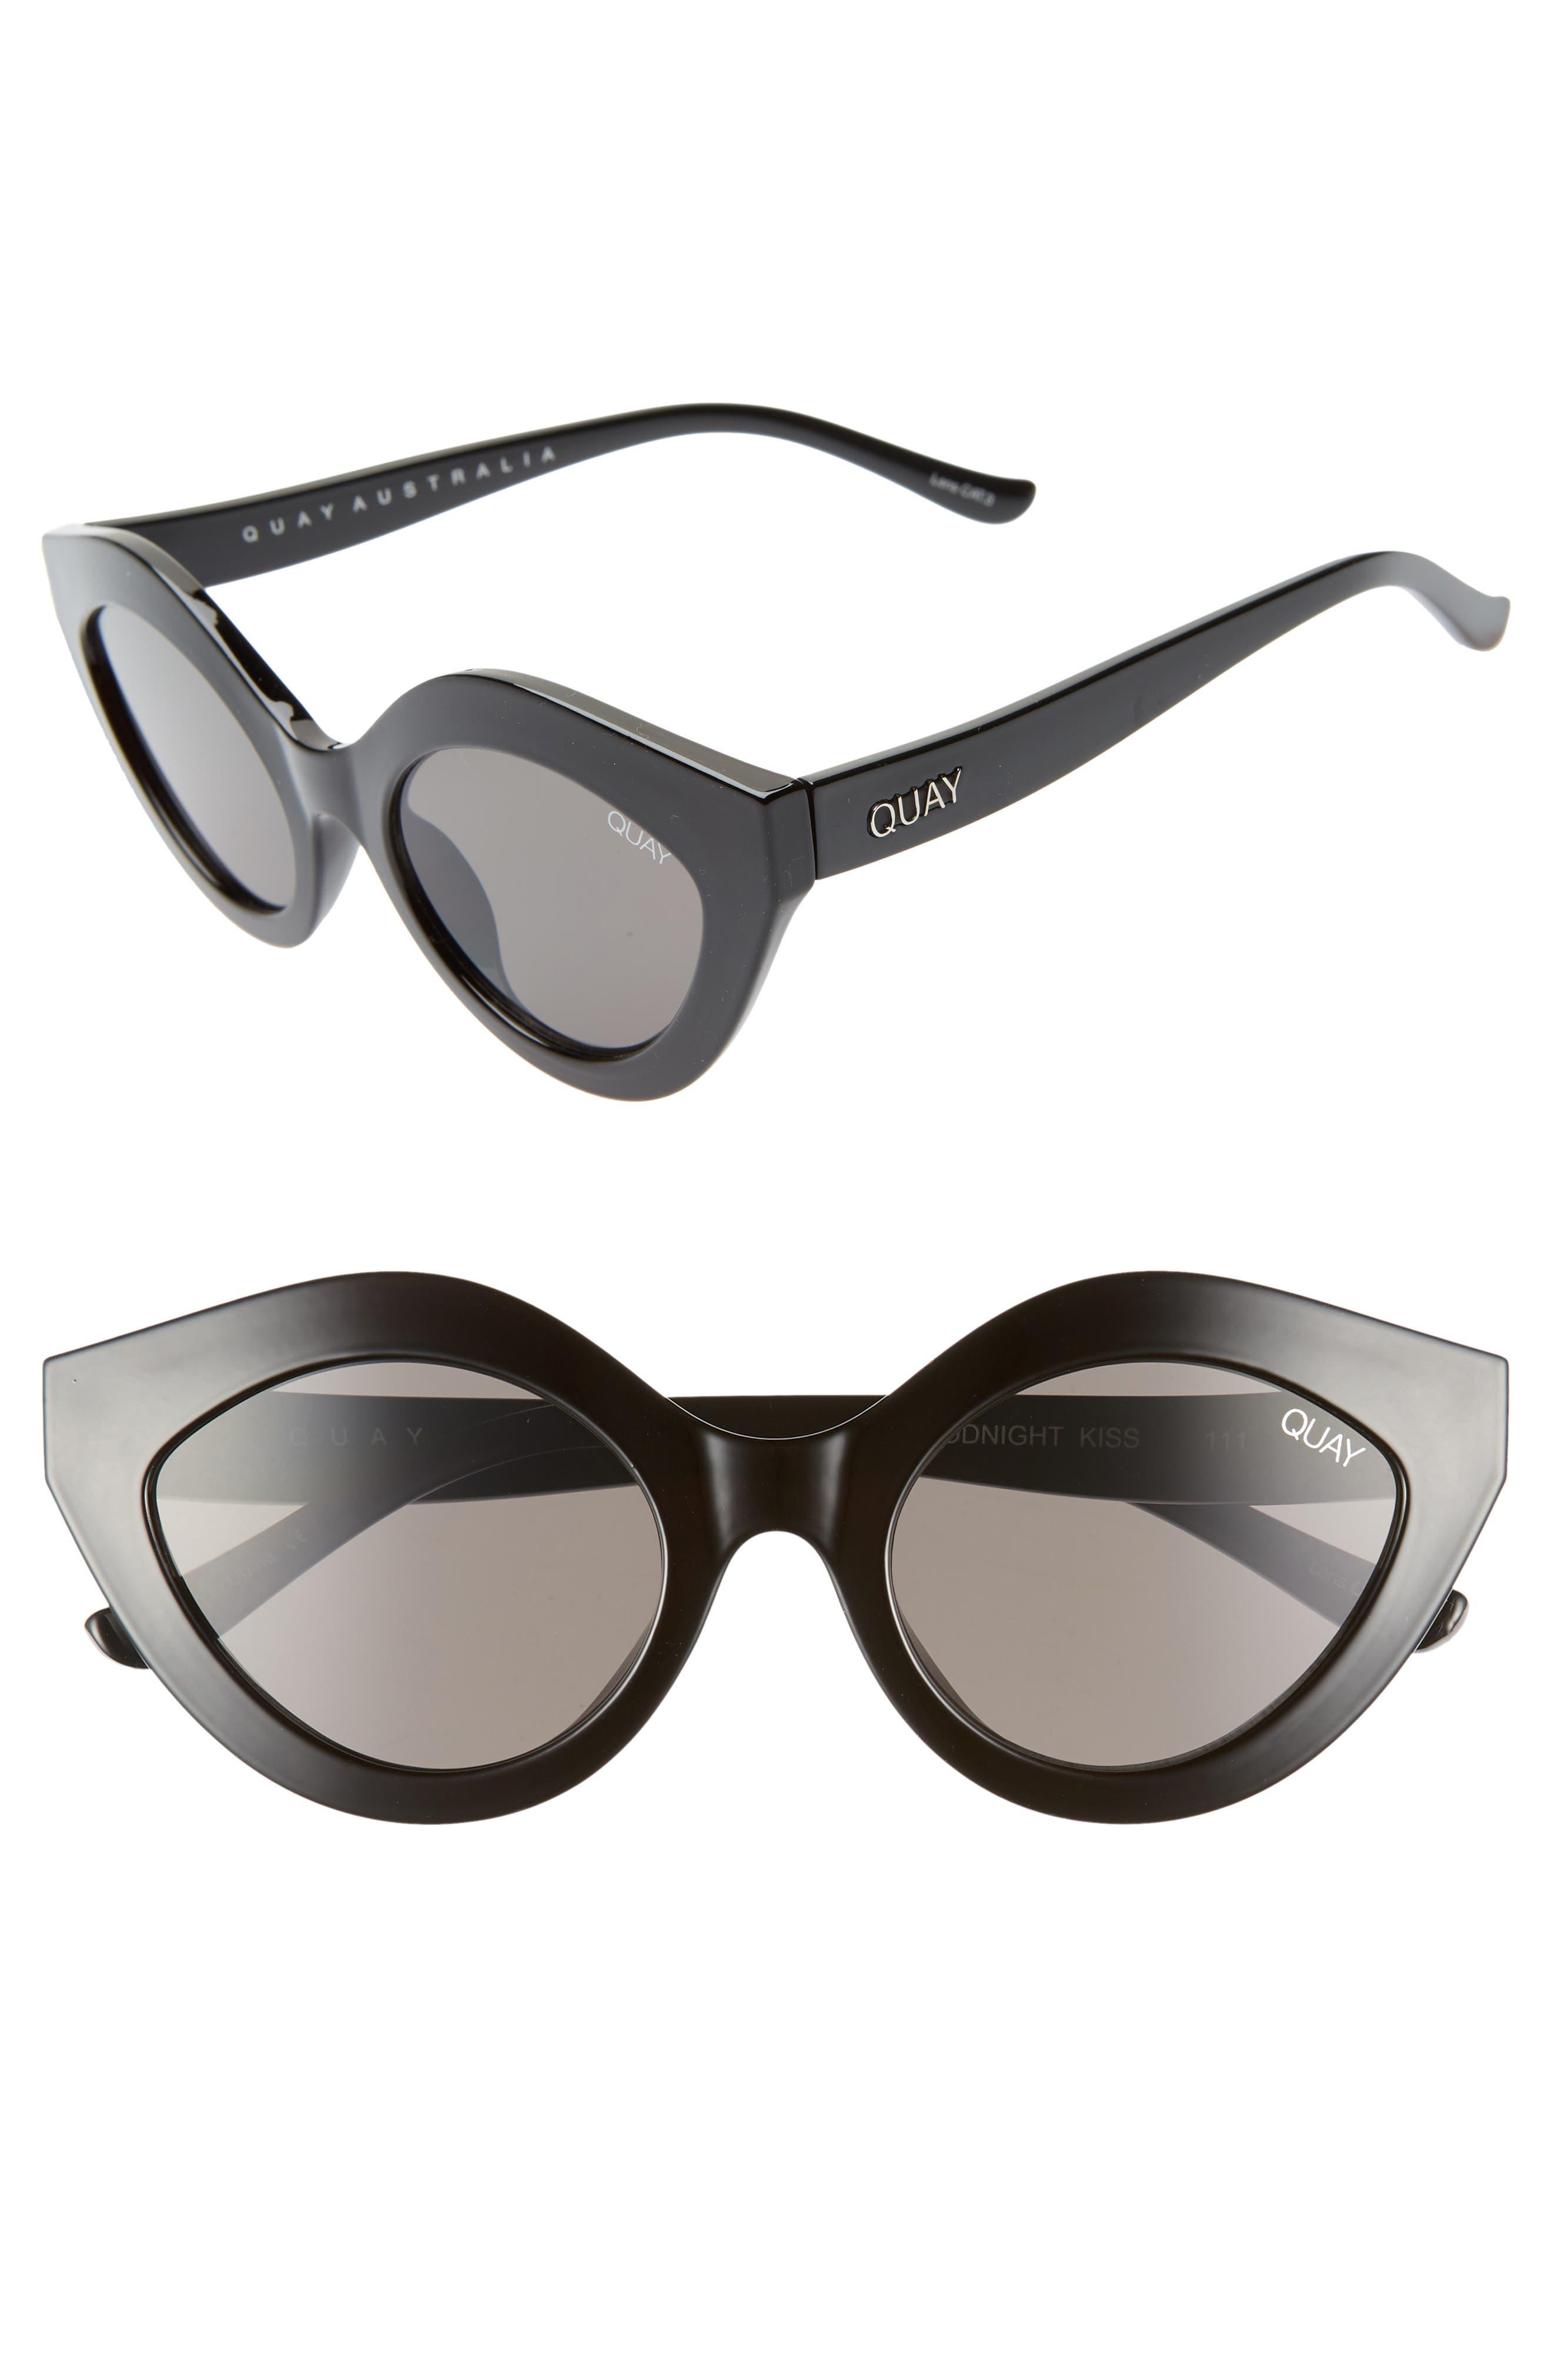 Quay Australia Goodnight Kiss Cat Eye Sunglasses - Black / Smoke